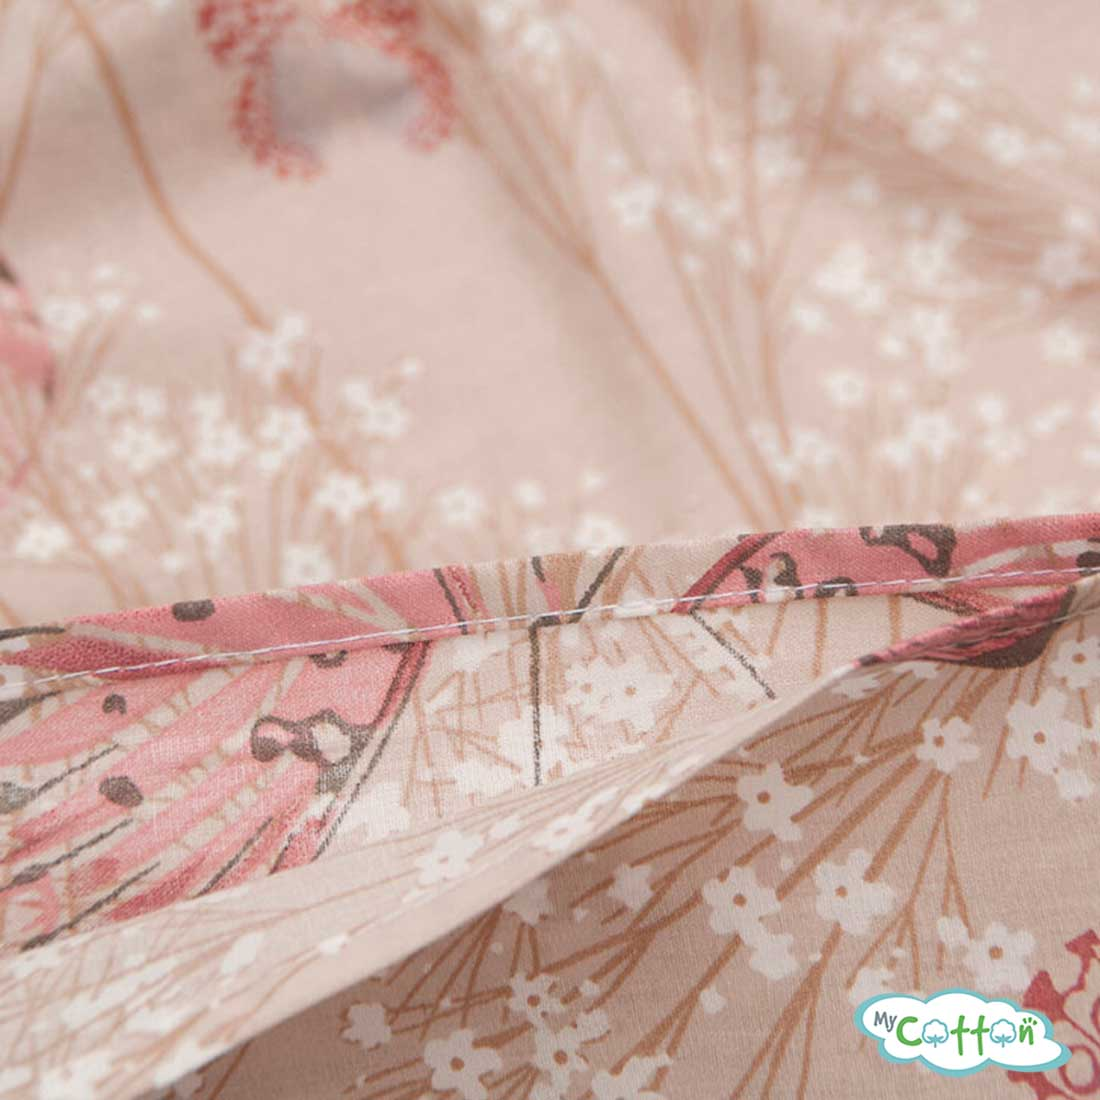 Постельное белье Butterflyколлекция Marilyn Monroe4